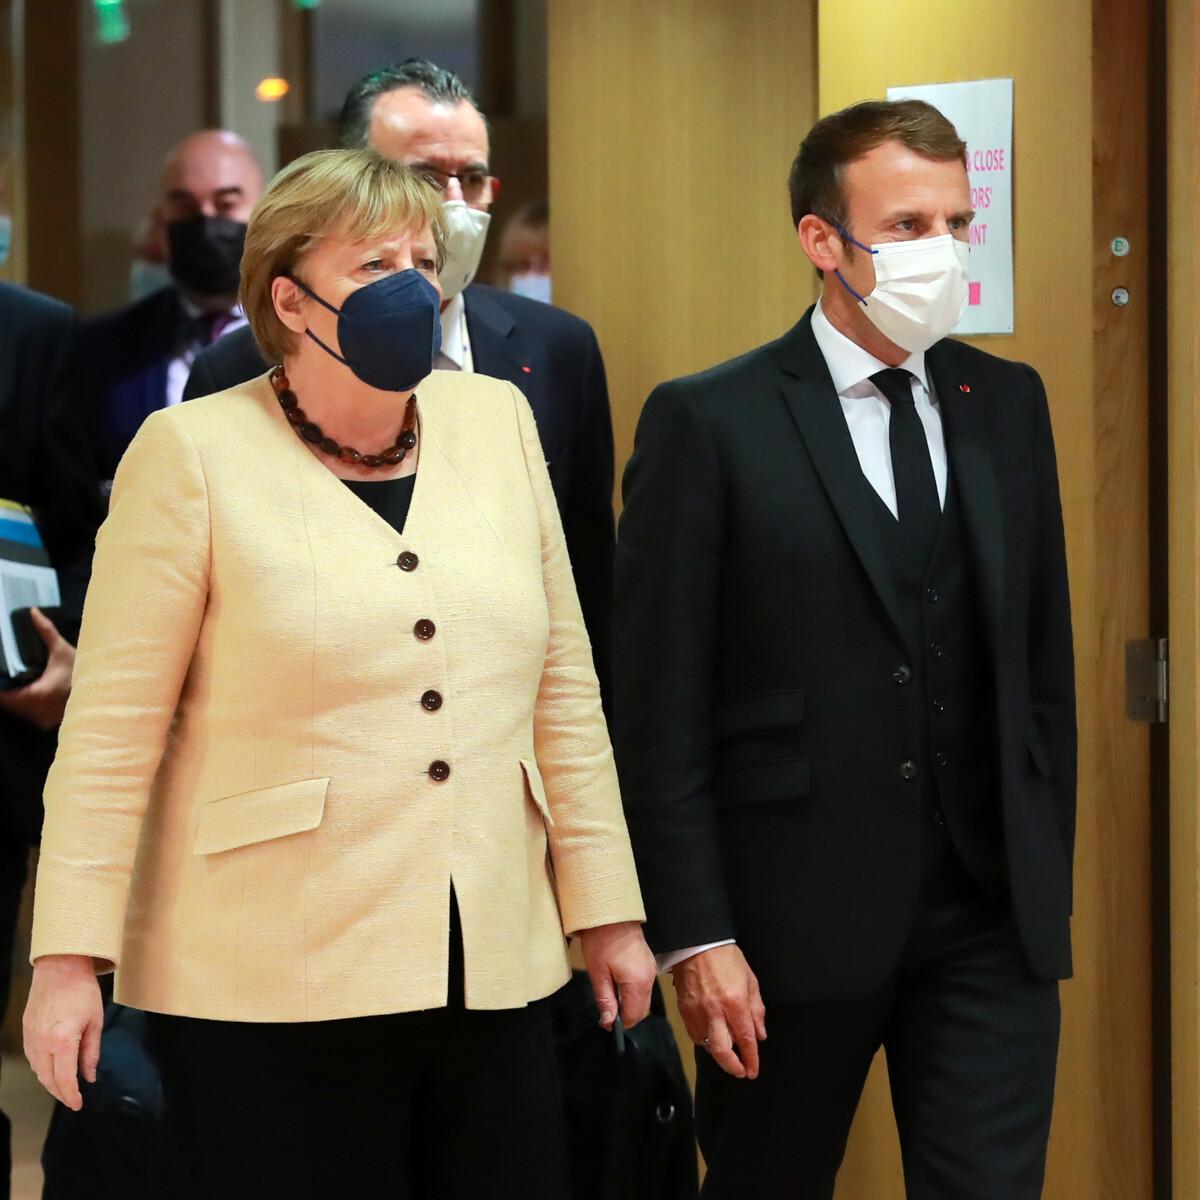 Punire la Polonia: dieci leader Ue vogliono il blocco dei fondi europei. Merkel e Macron salvano Varsavia